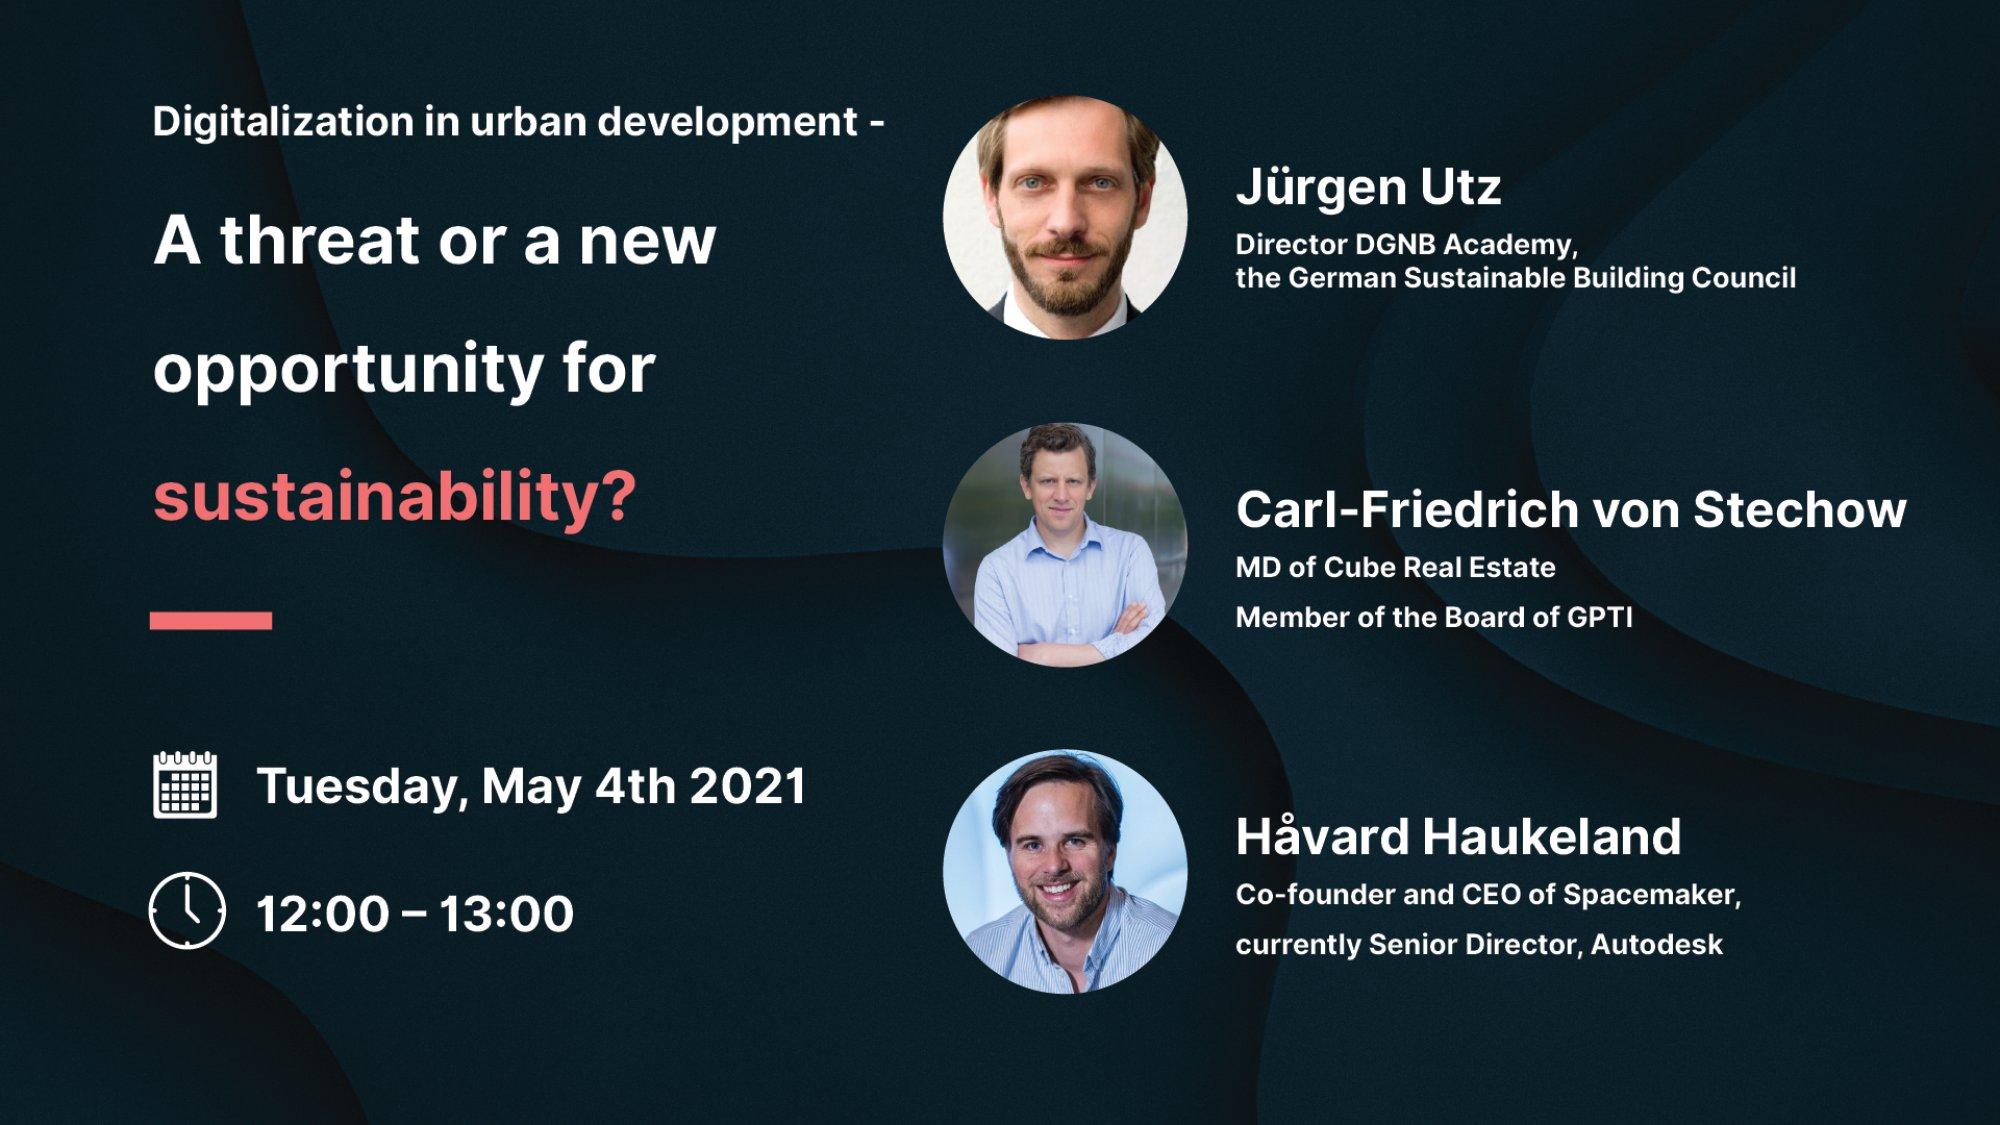 digitalization-in-urban-development